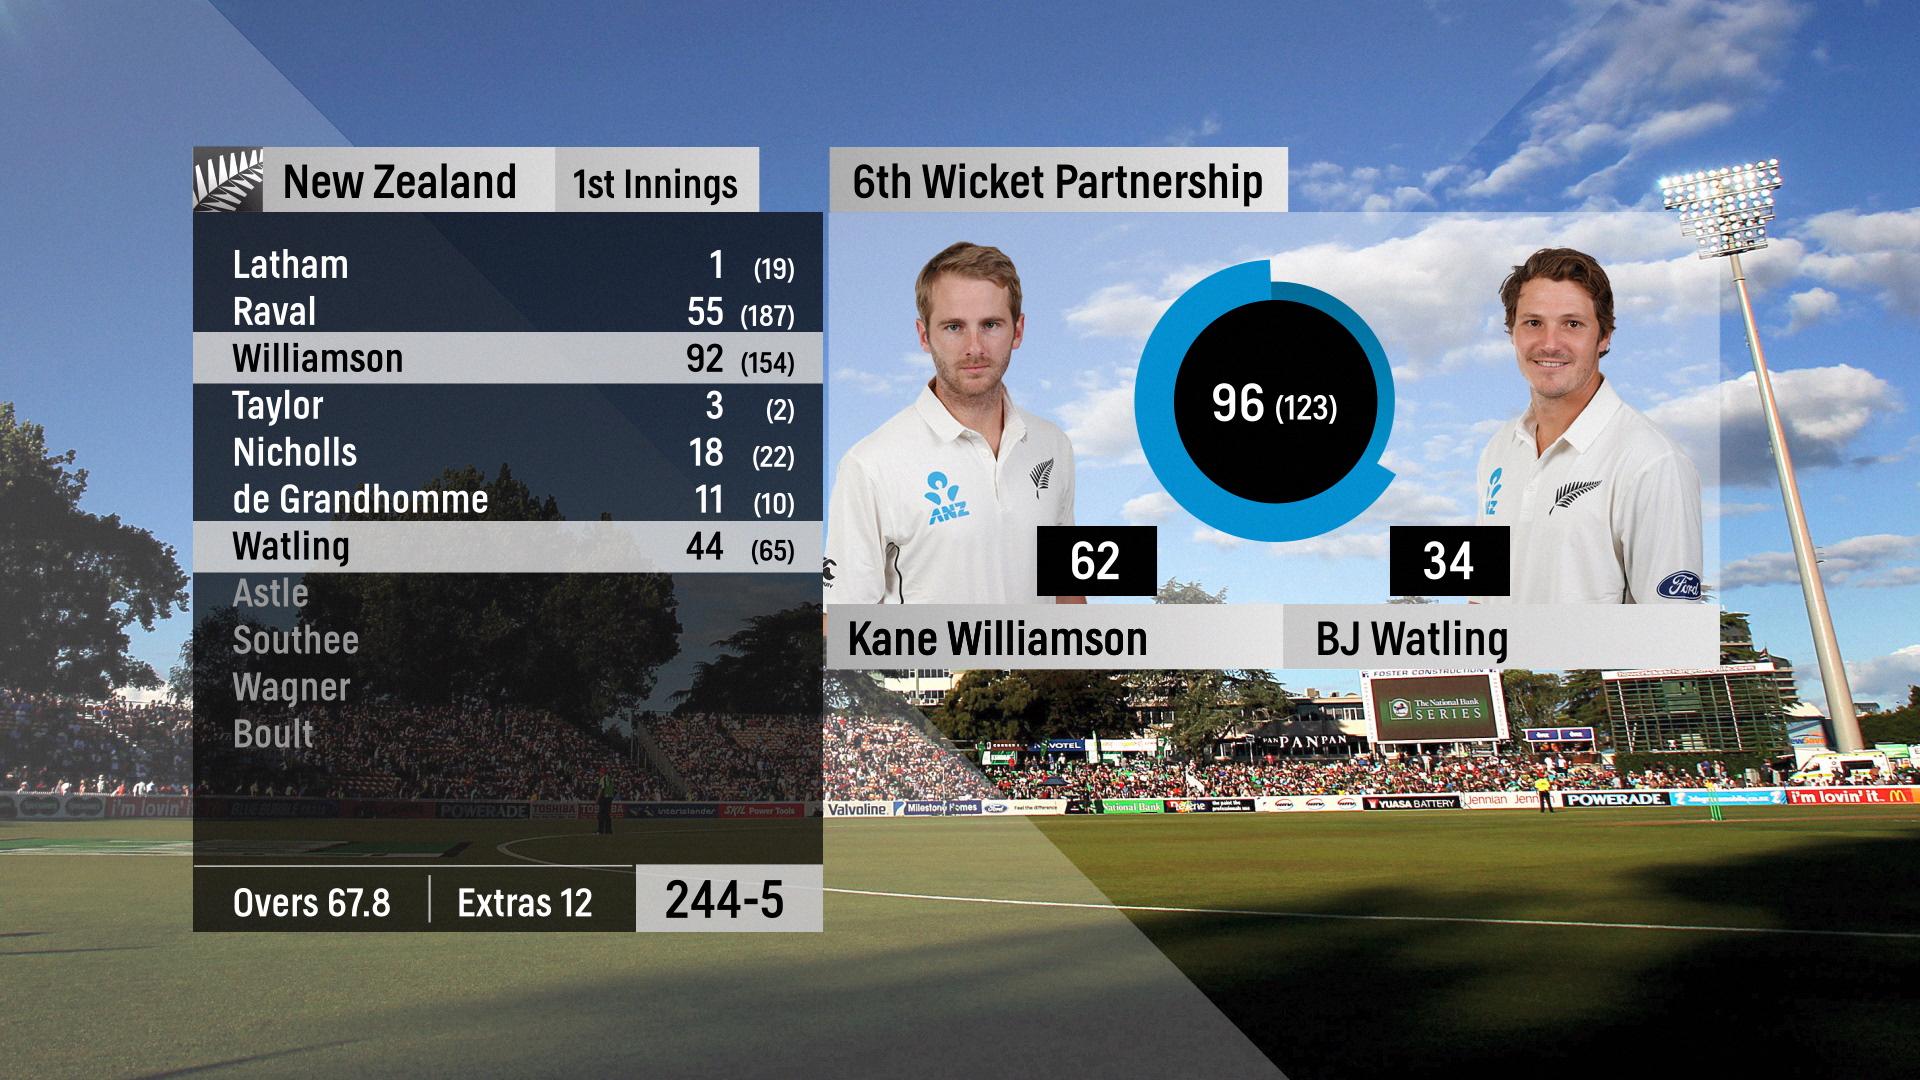 Sky NZ: Cricket